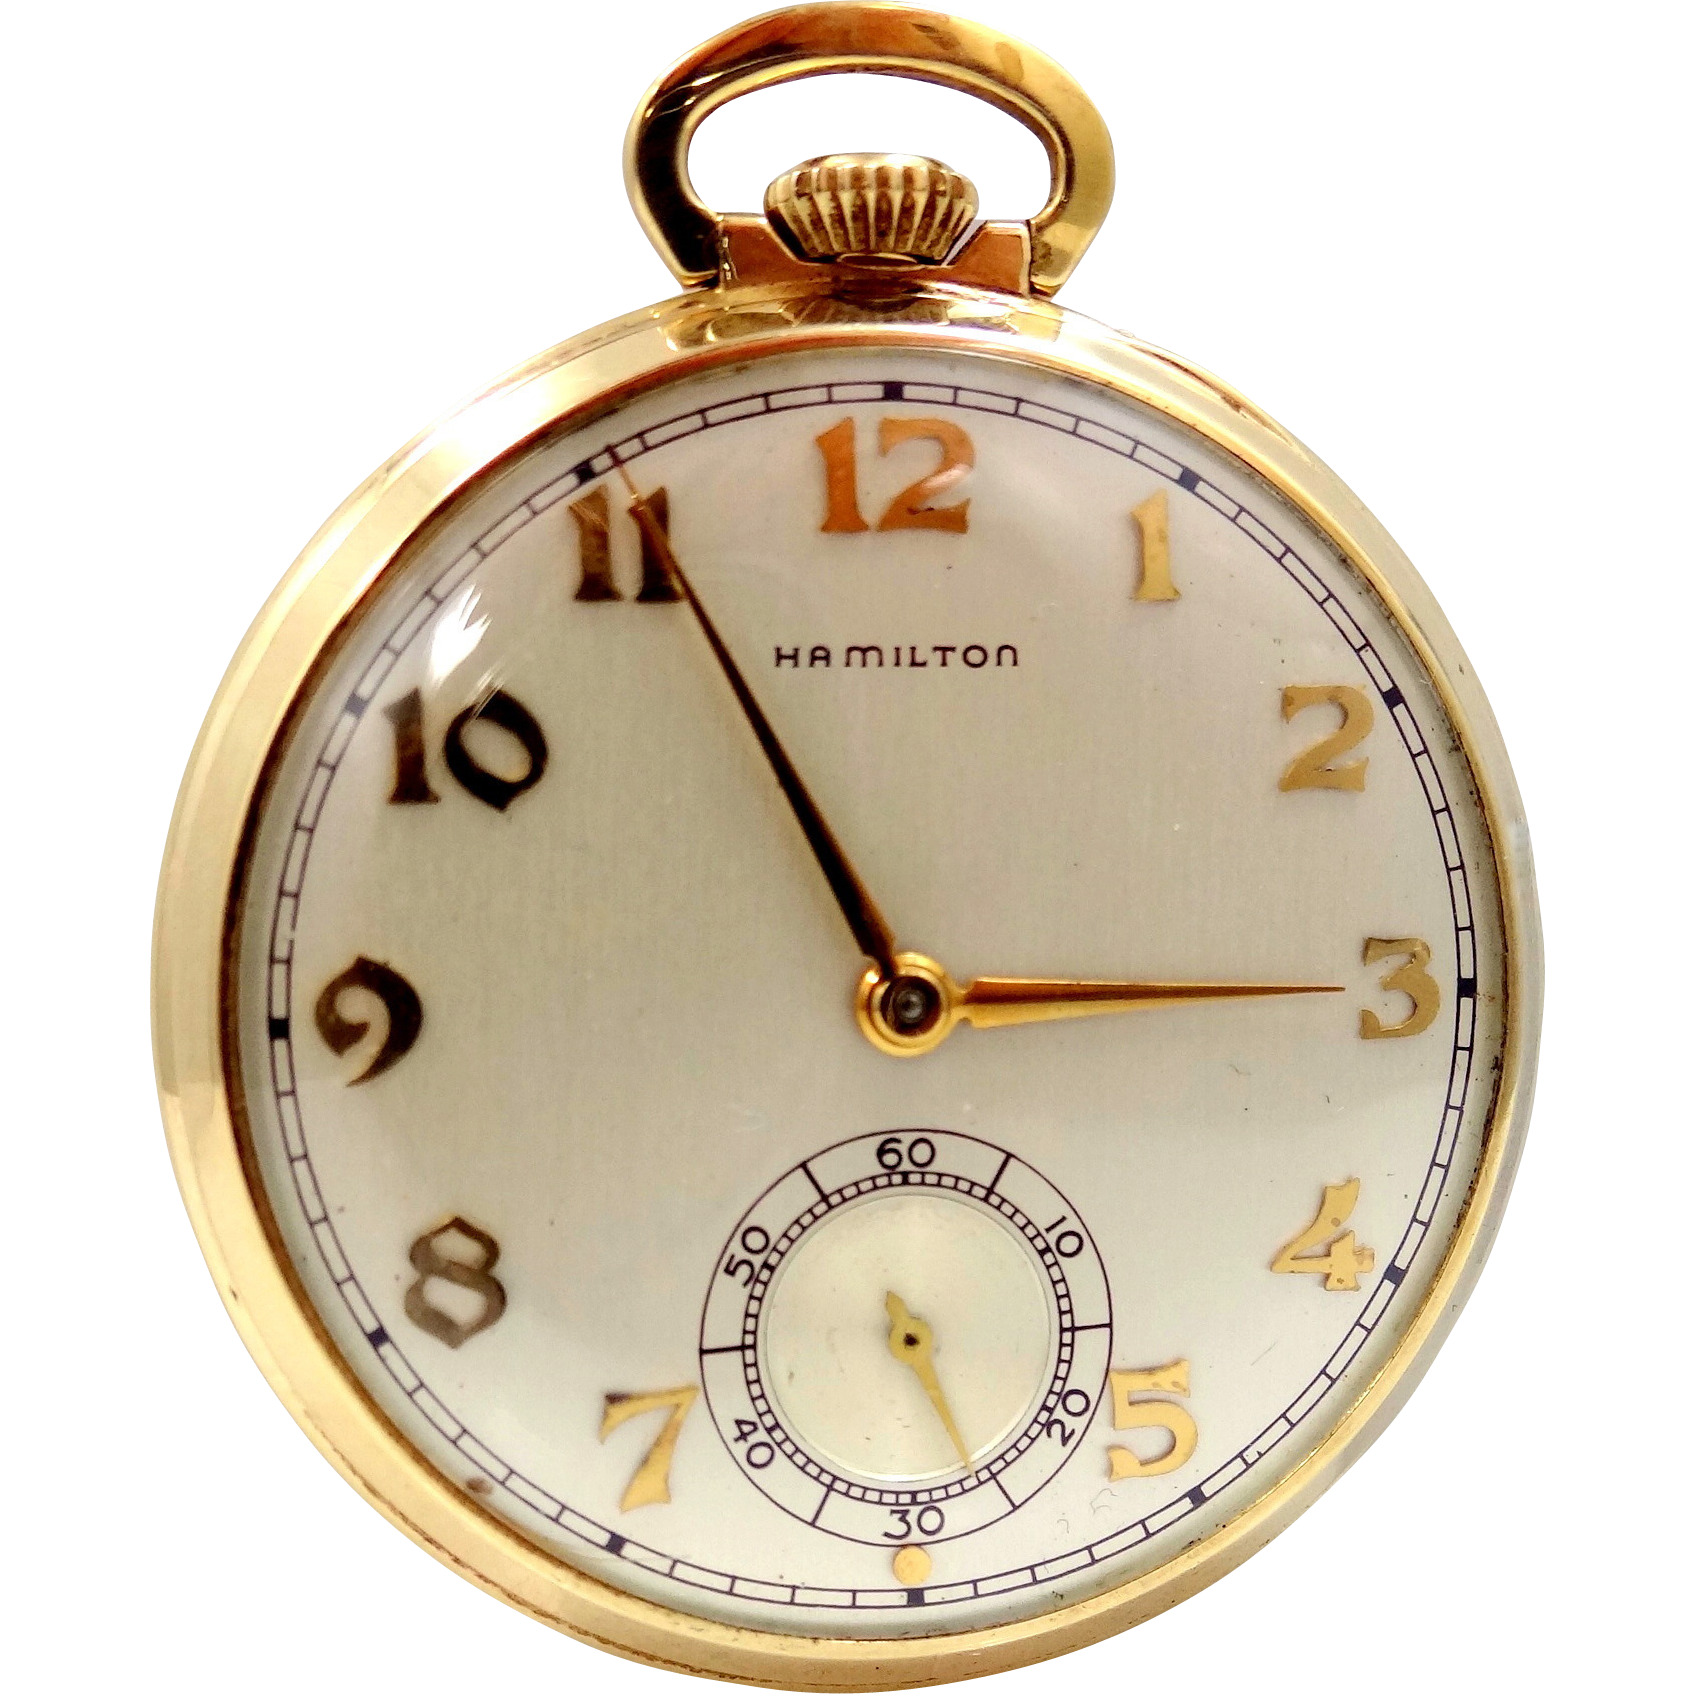 Vintage 14k Gold Hamilton Pocket Watch Model 917 17 Jewels Lukens Steel Co Hamilton Pocket Watch Vintage Pocket Watch Vintage Watches